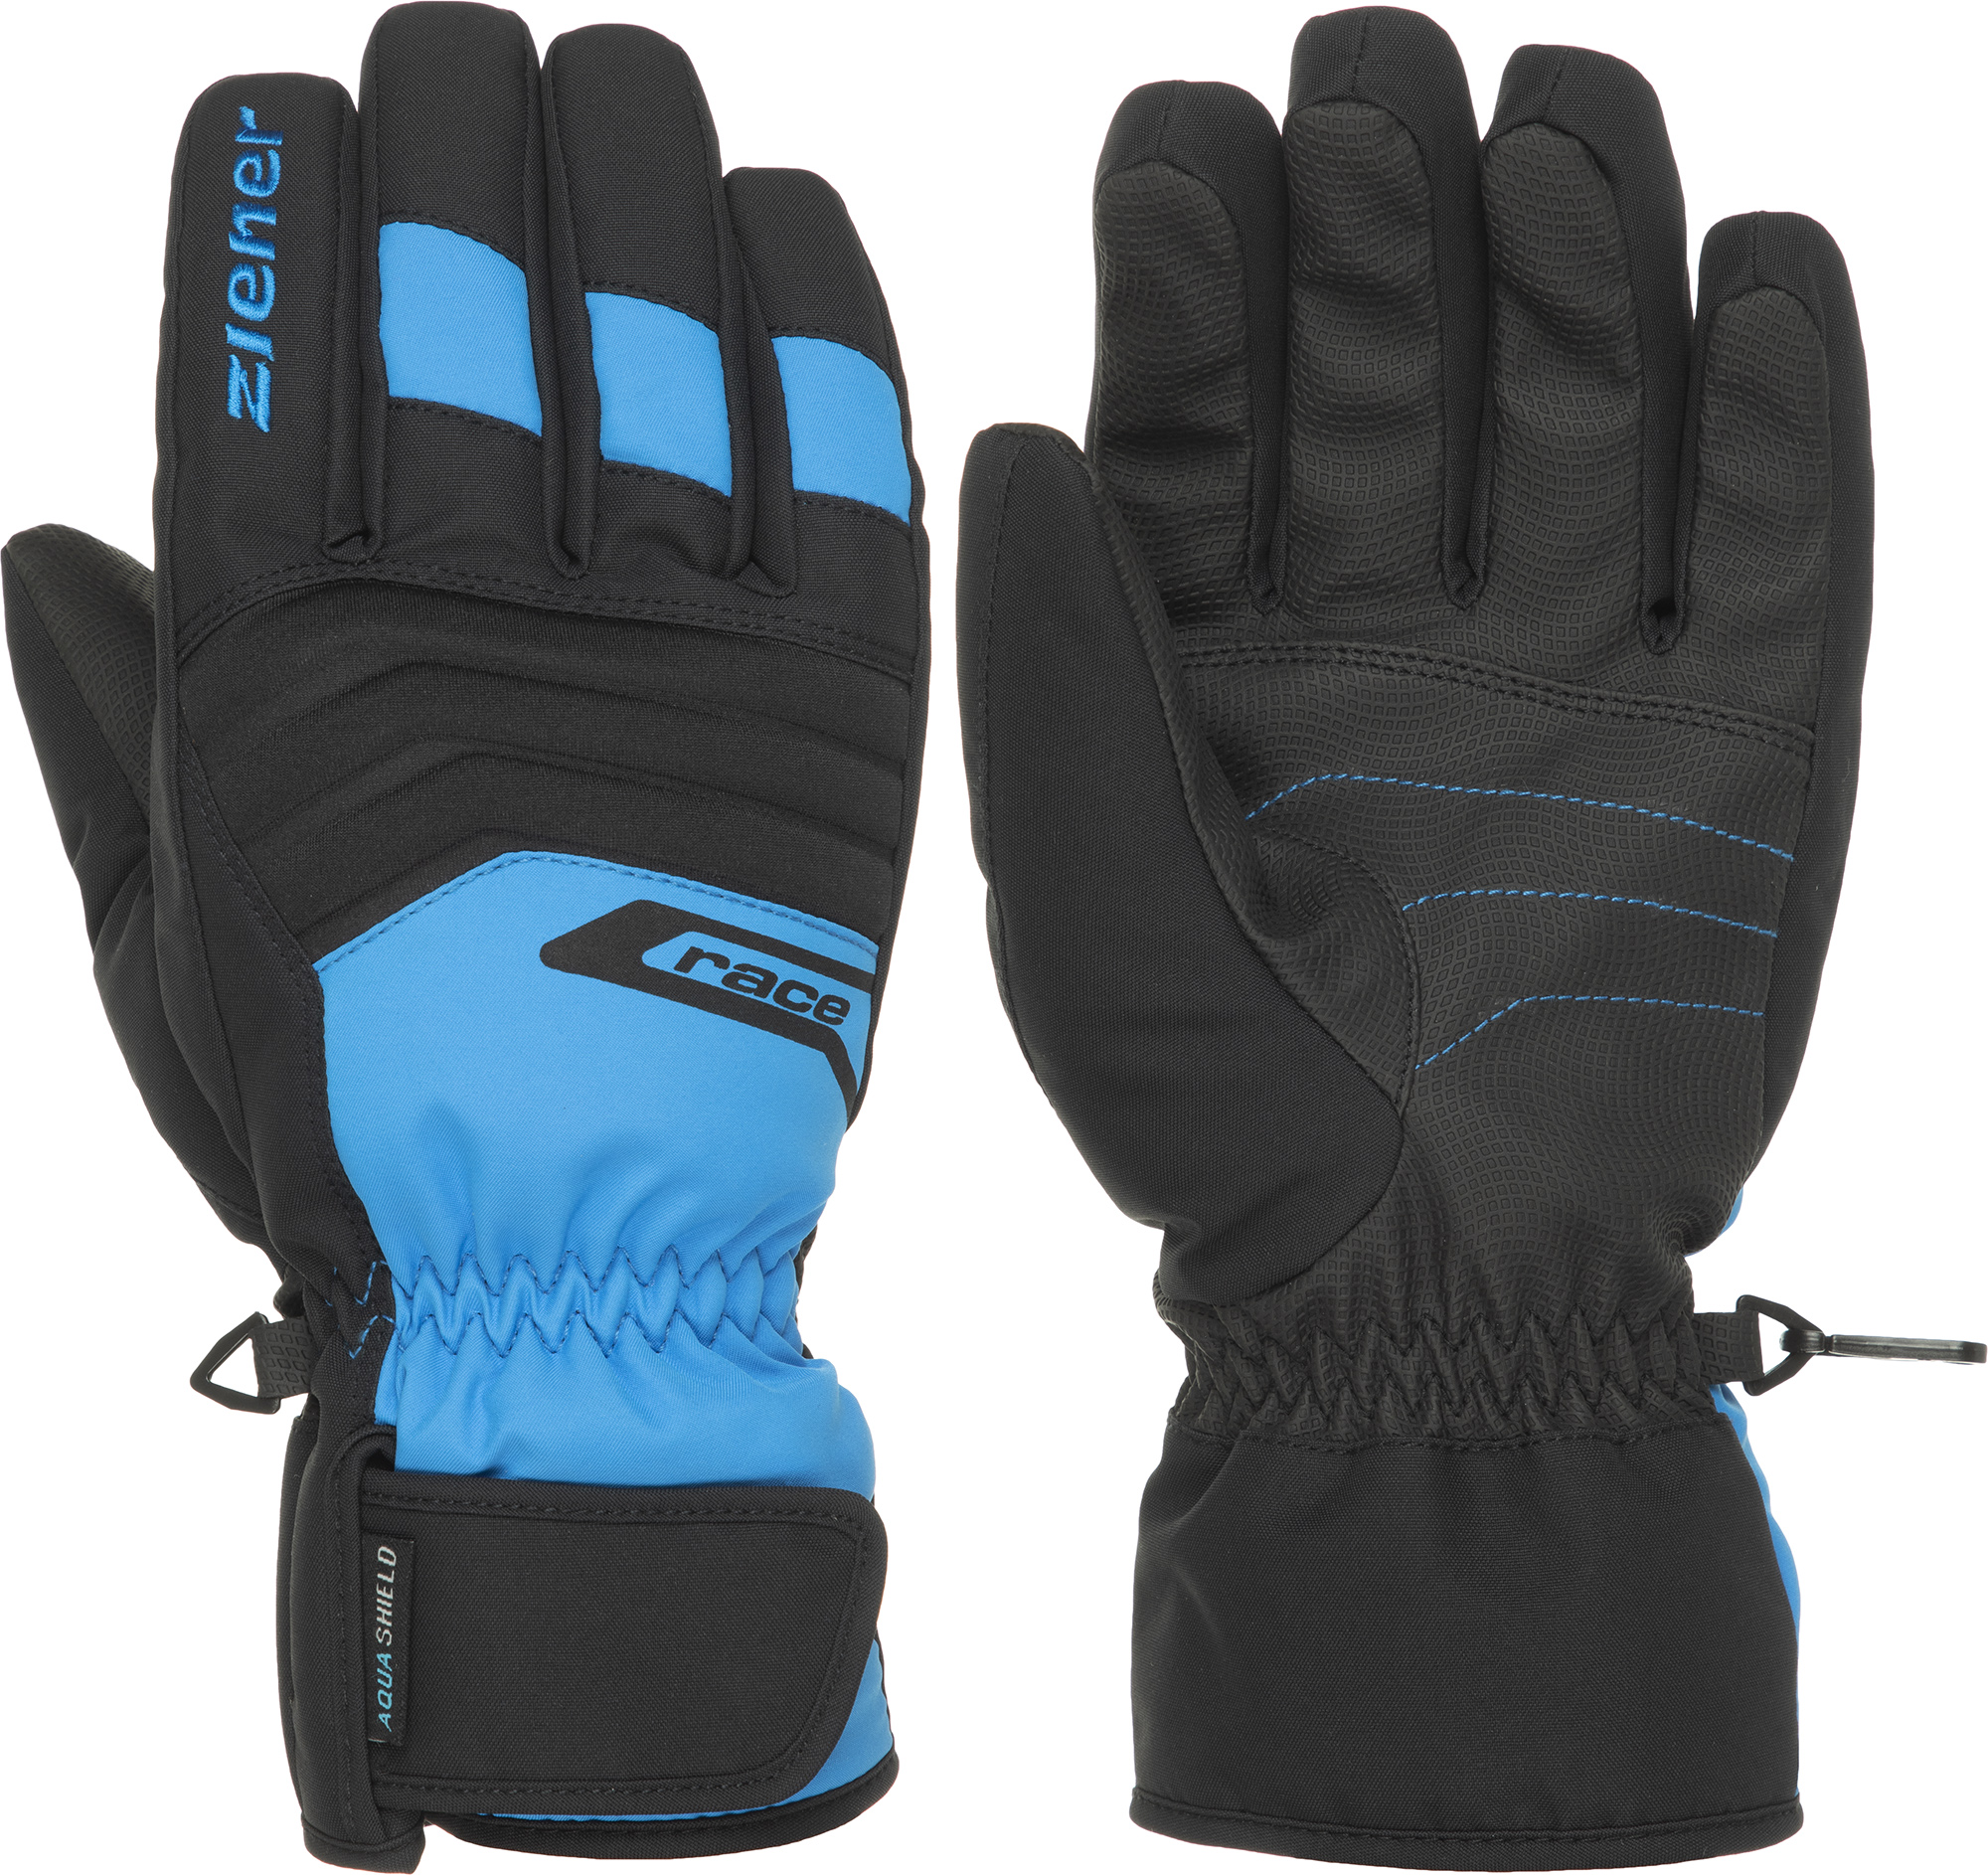 Ziener Перчатки мужские Ziener Gregg, размер 8,5 ziener перчатки мужские ziener gliss gtx размер 9